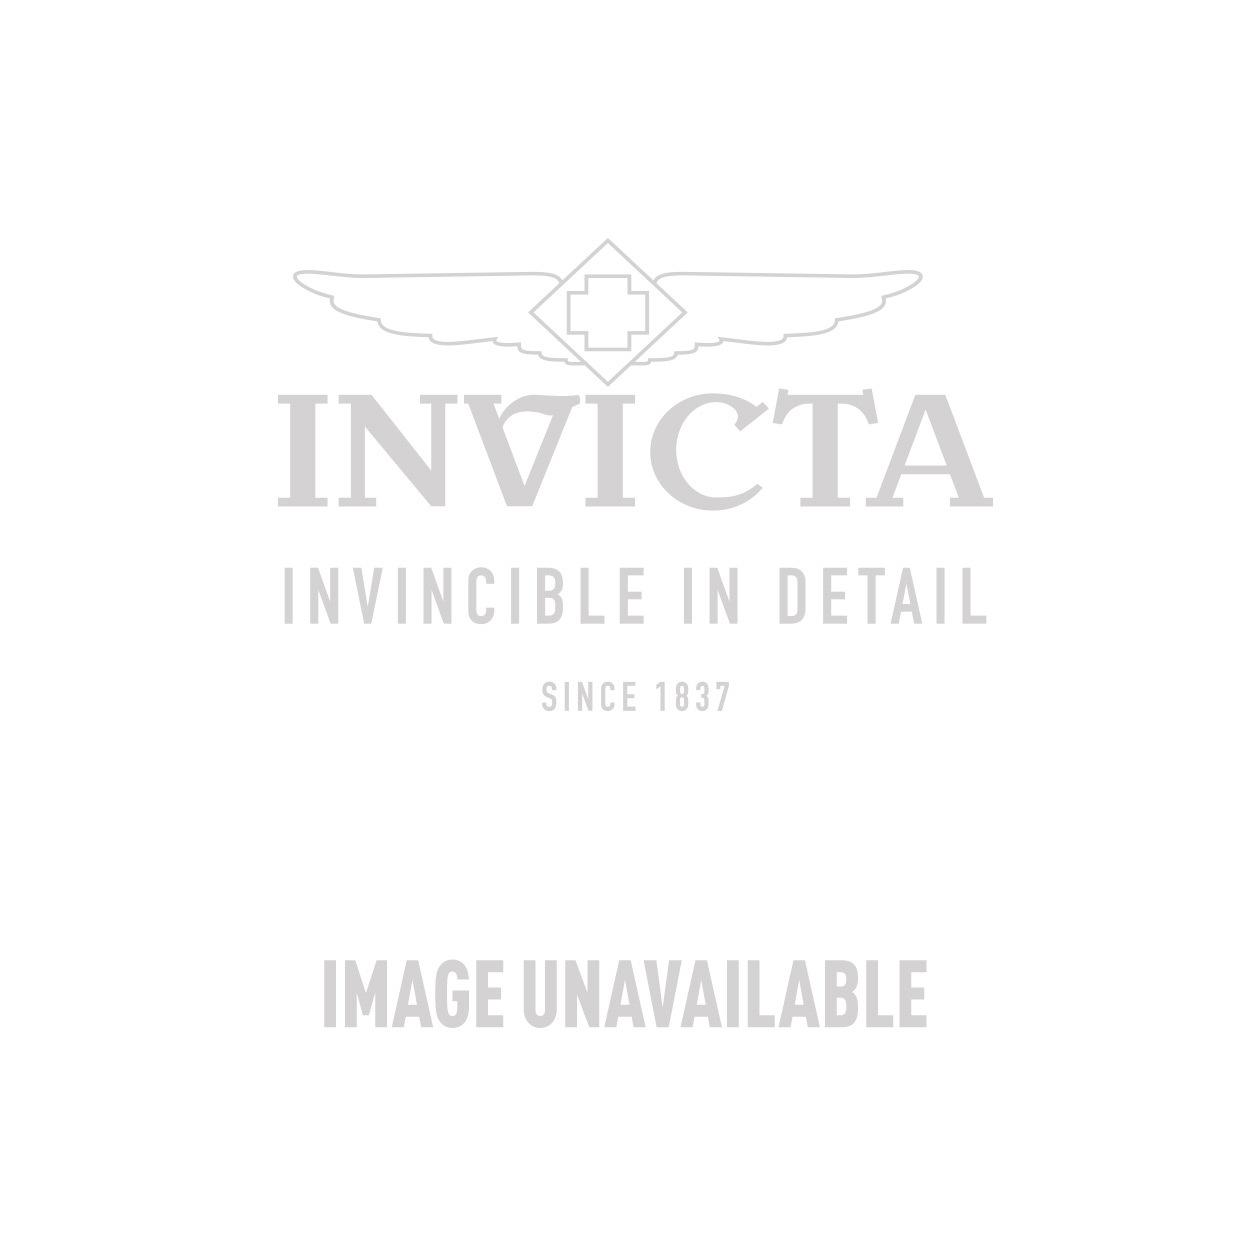 Invicta Subaqua NOMA III Mens Quartz 50mm Black Case Stainless Steel Dial  Model - 0805 - Official Invicta Store 69f8f88d857